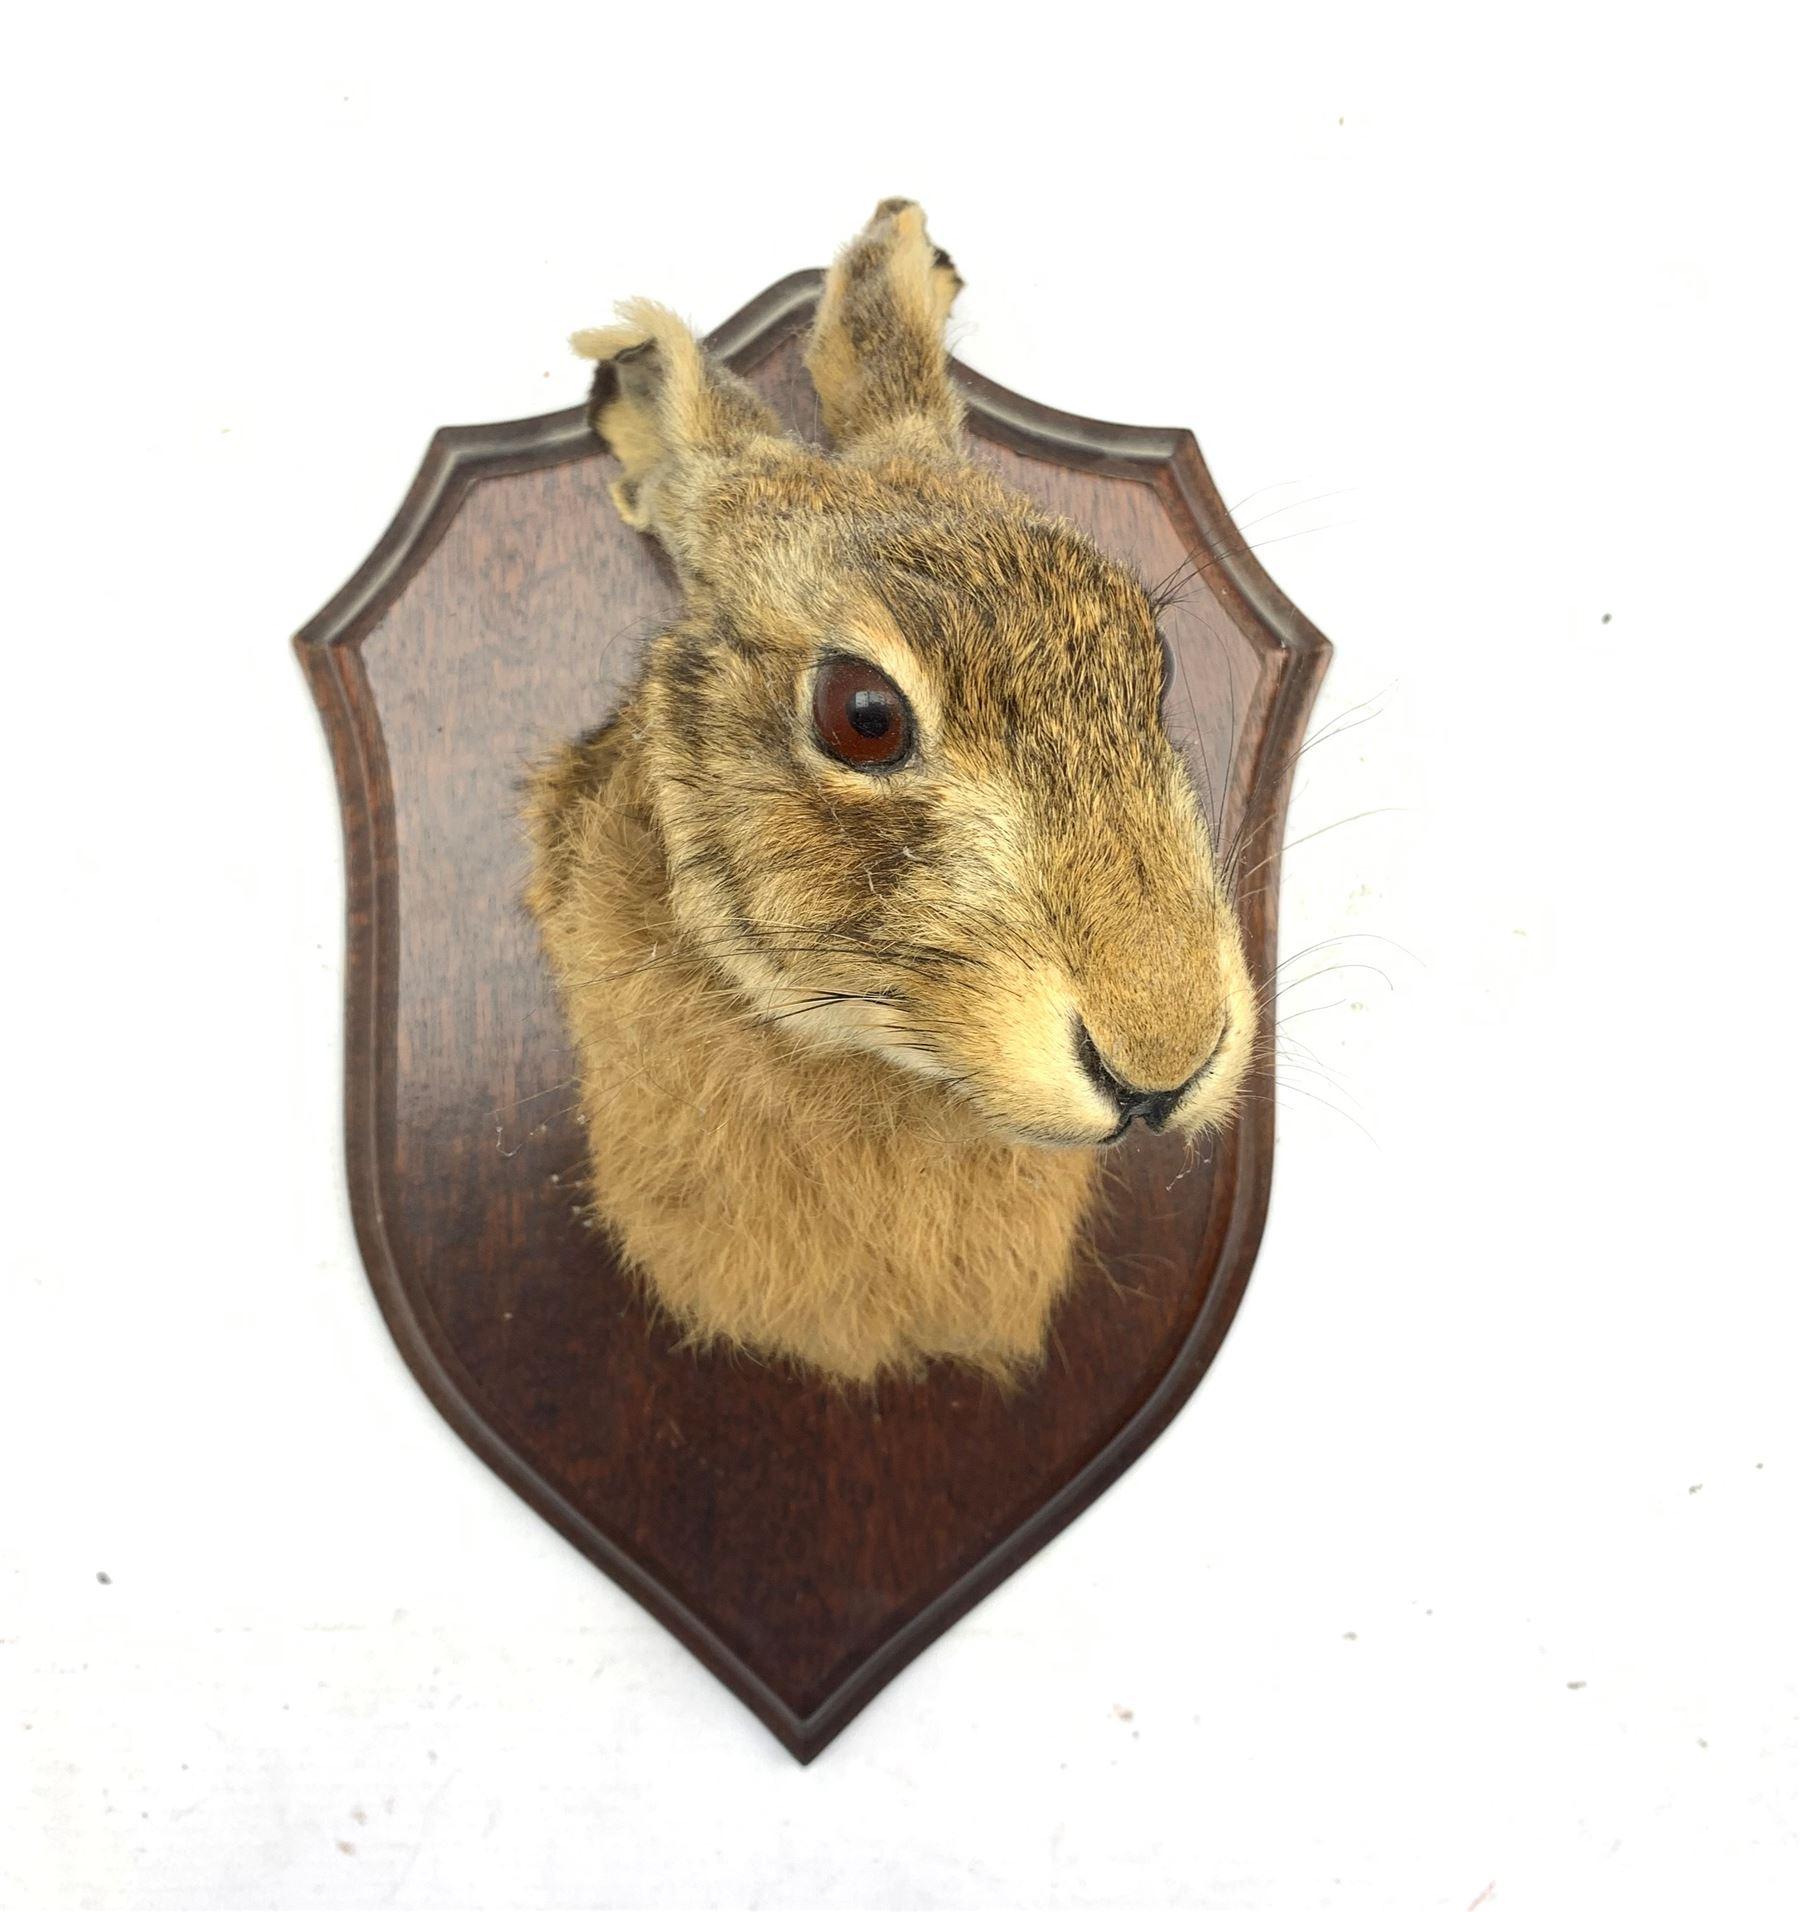 Taxidermy: Hare mask mounted on oak shield